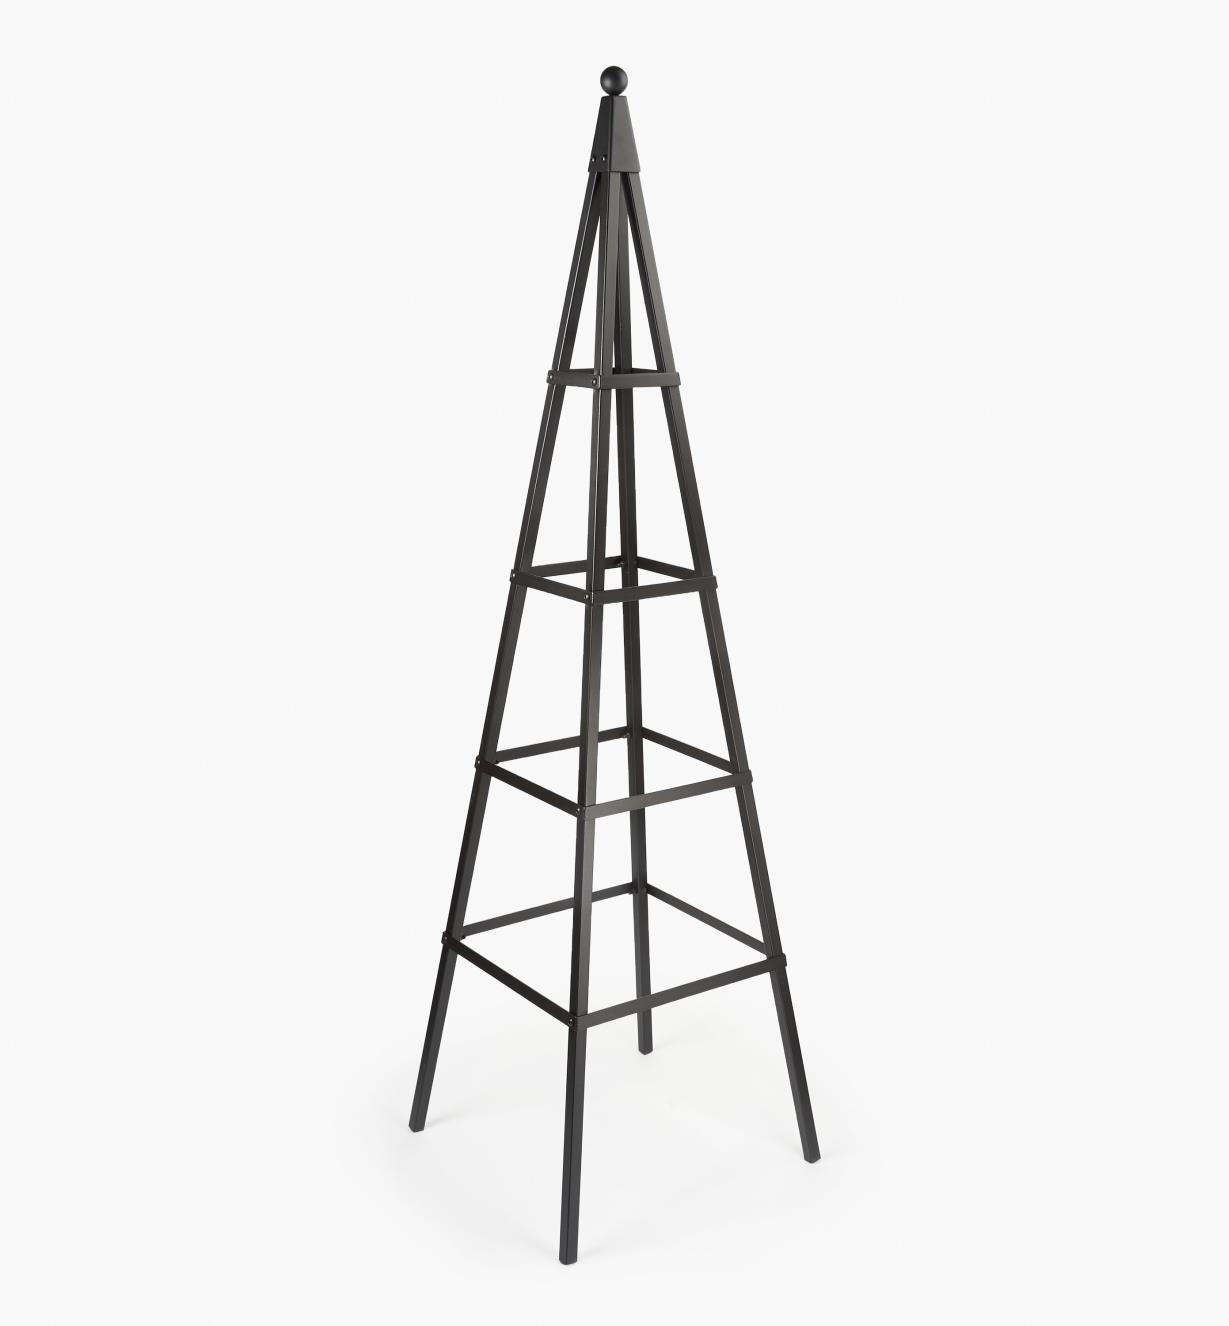 PD242 - Pyramid Obelisk